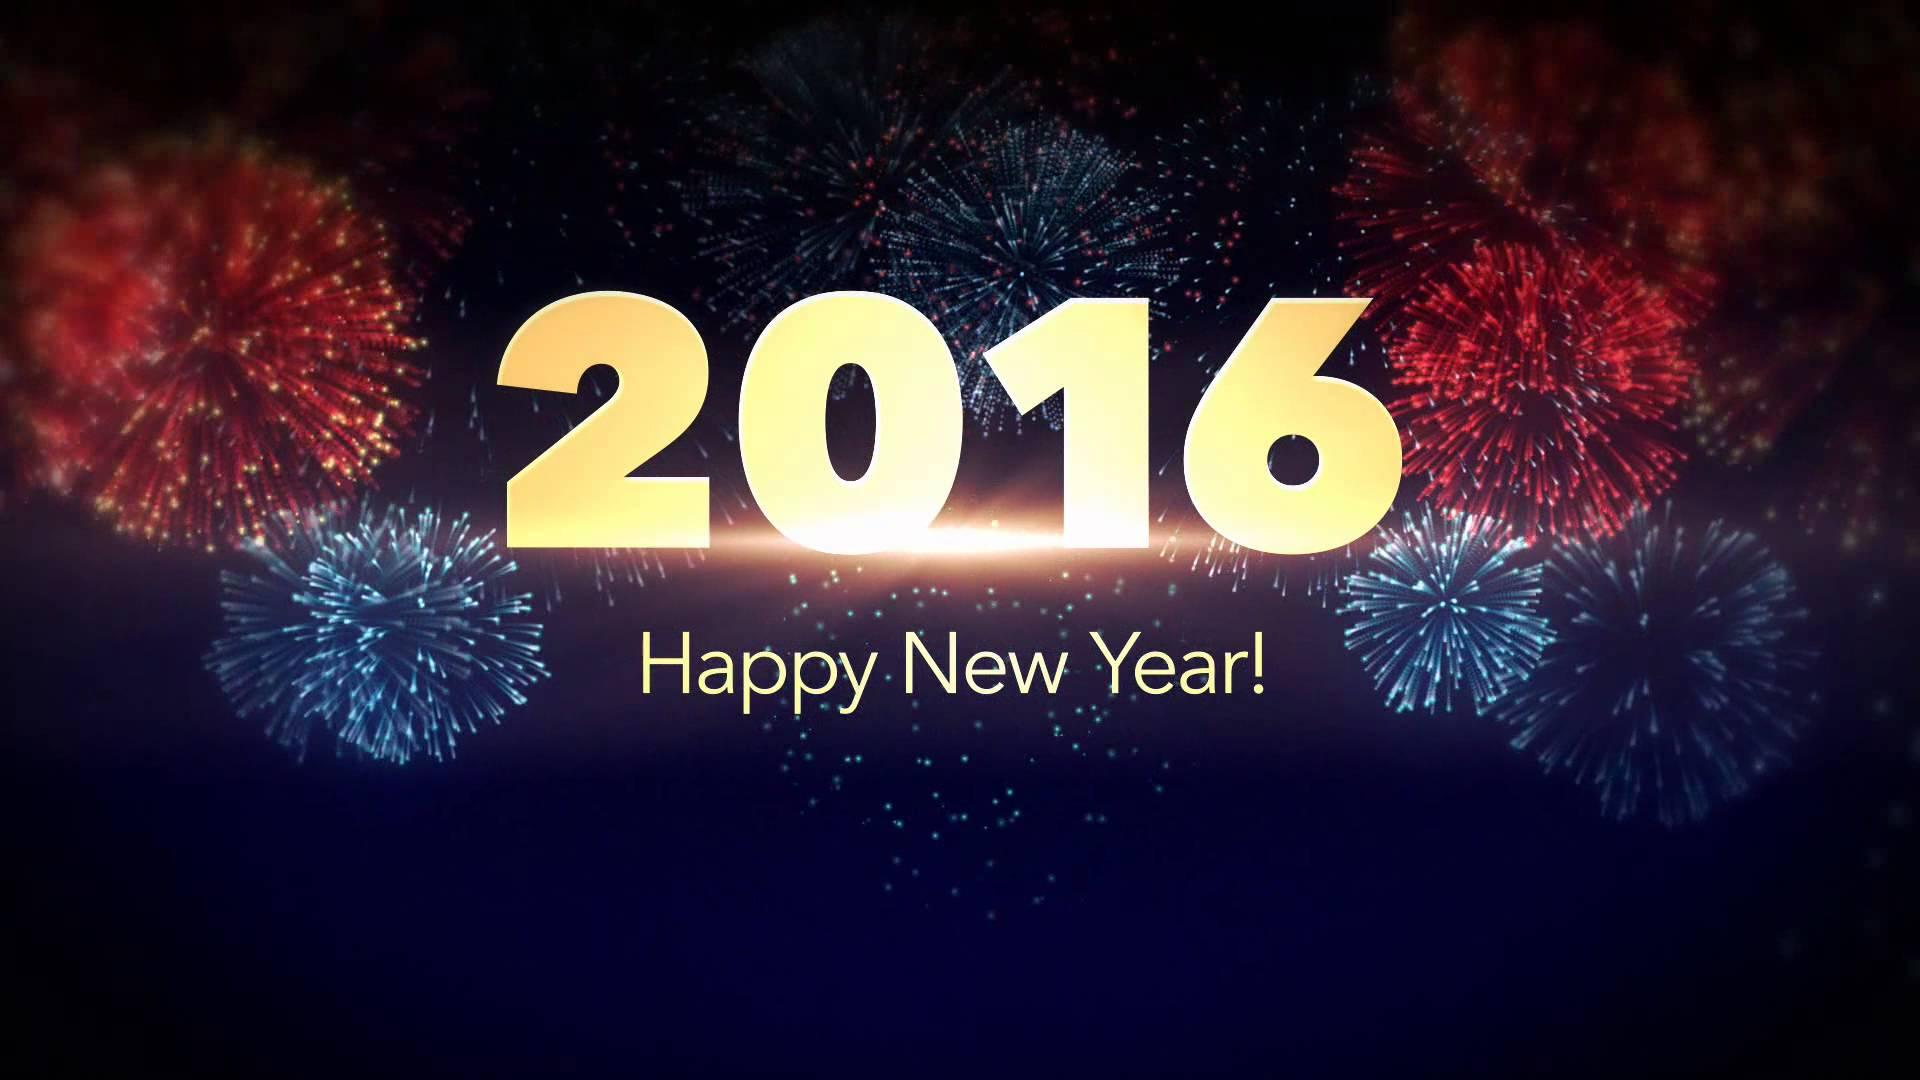 Wallpaper Happy New Year 2016